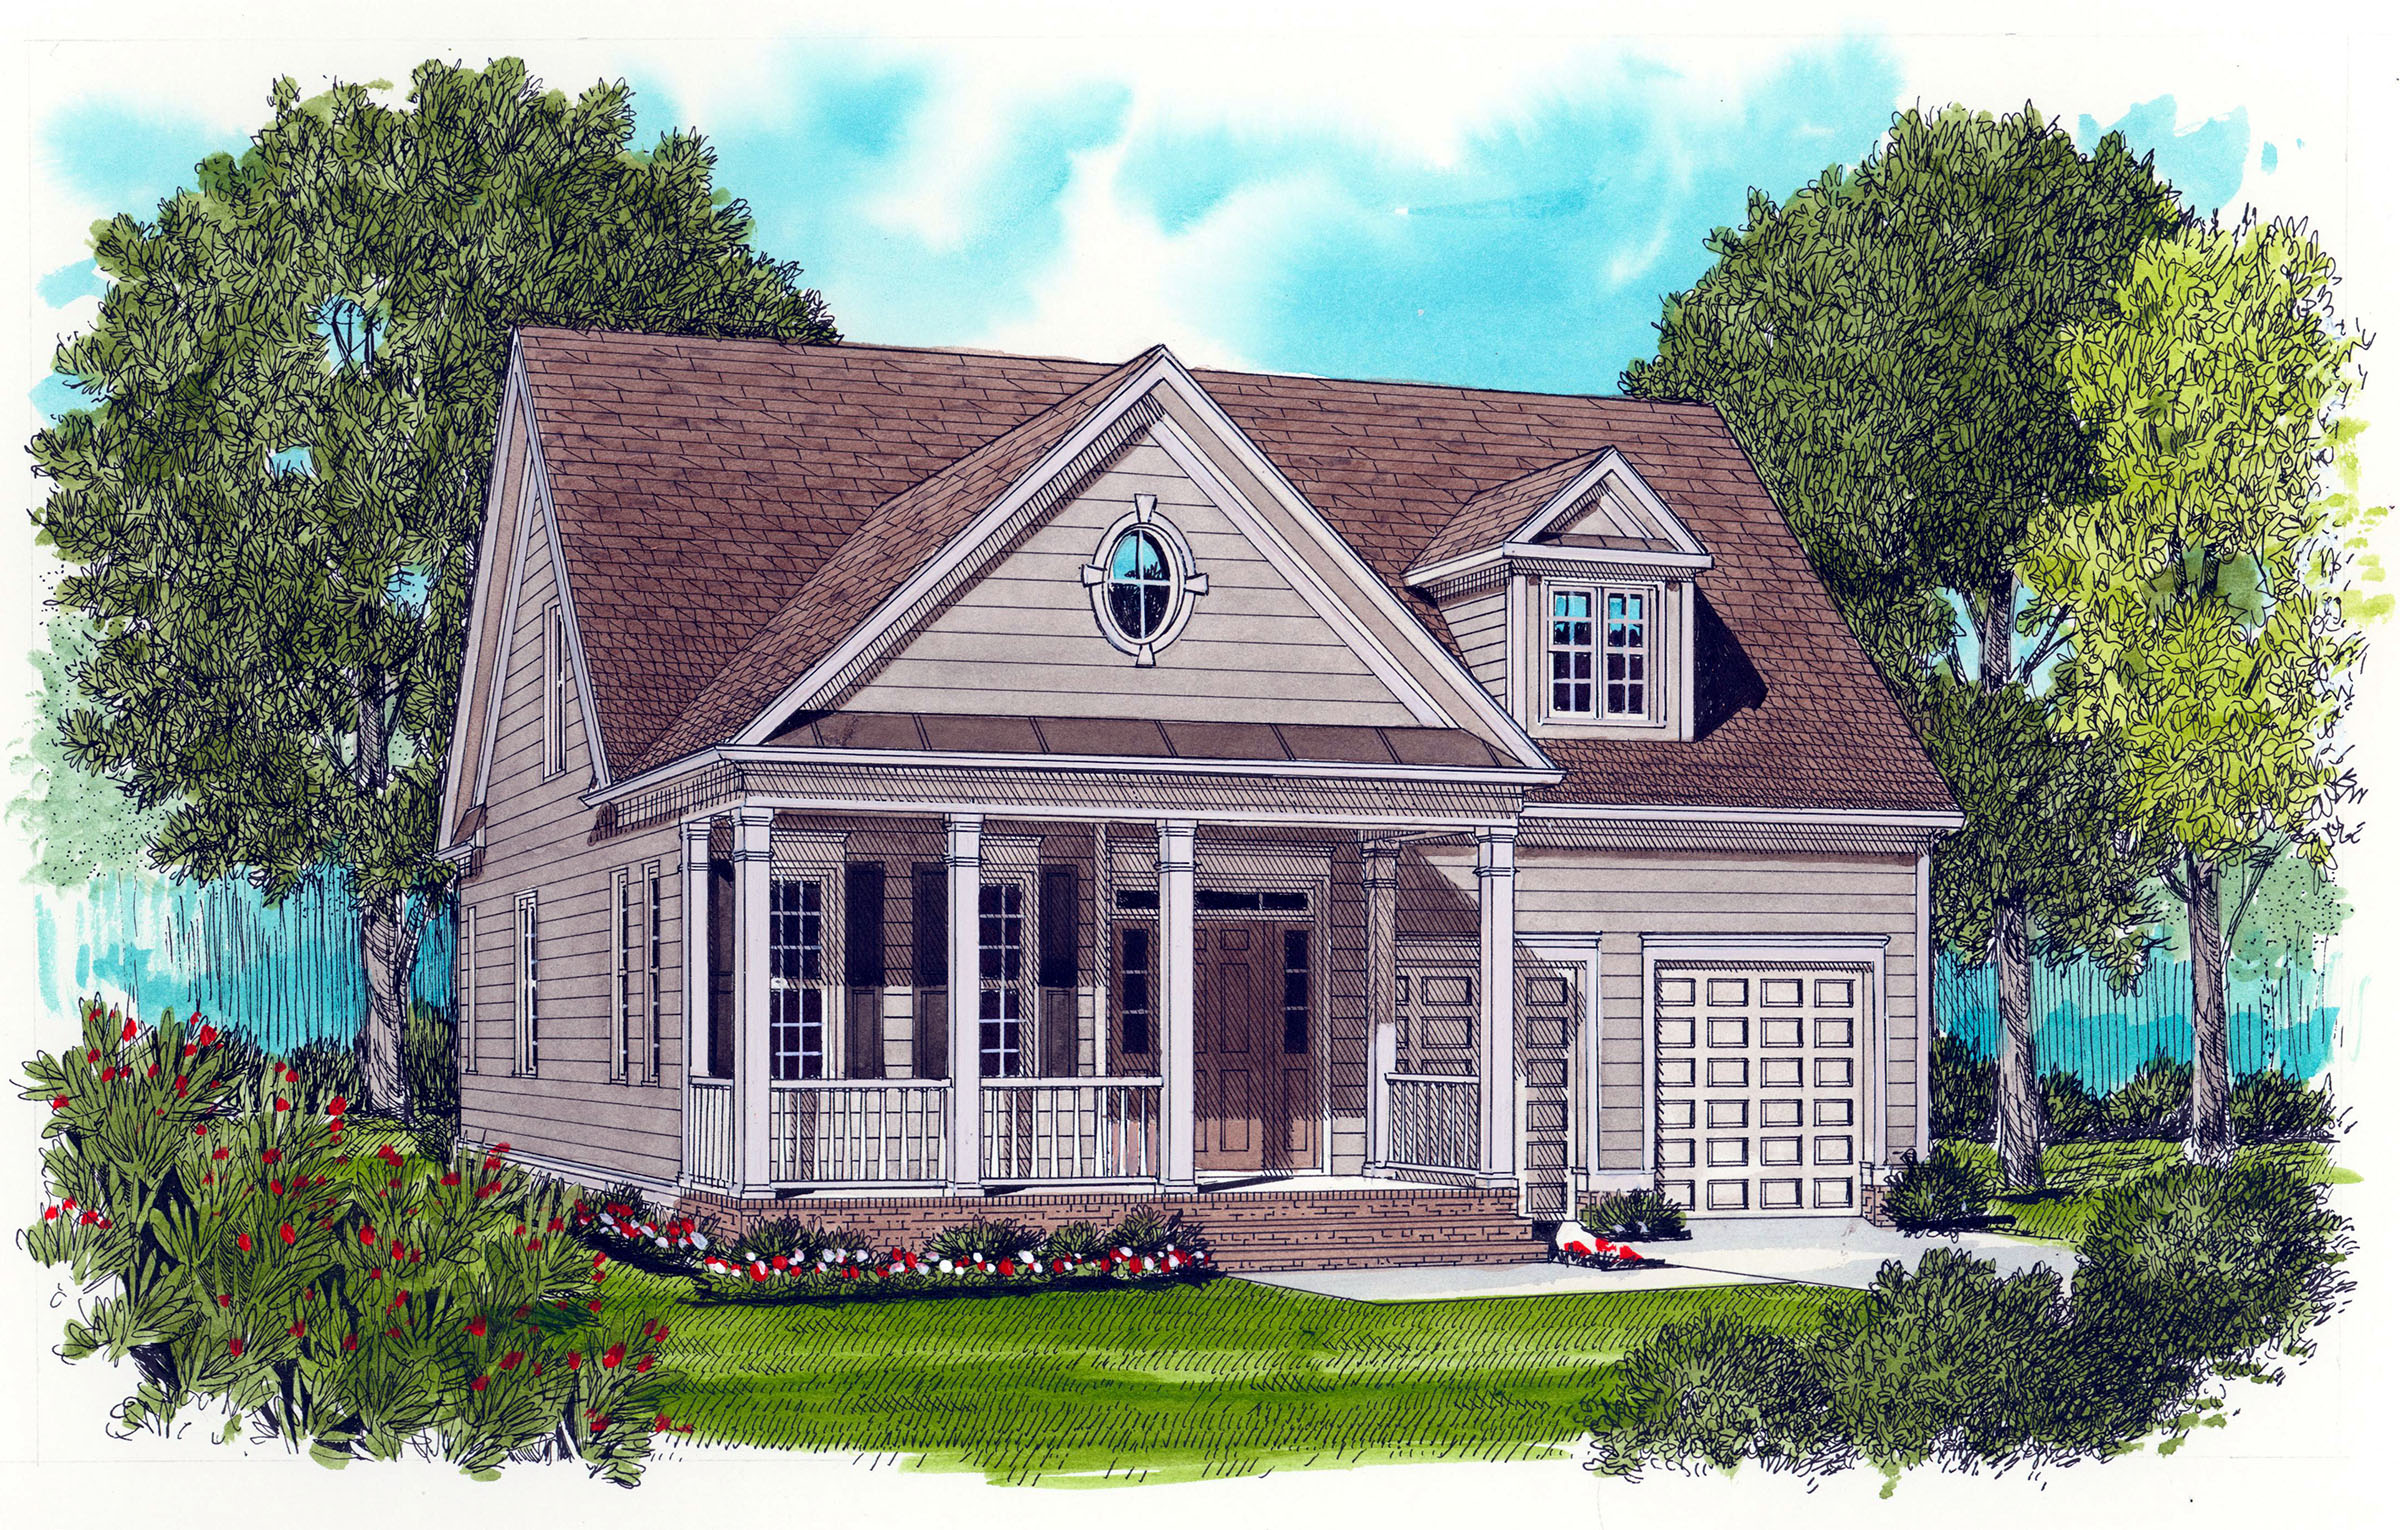 Covered Porch Home Plan 9360el Architectural Designs